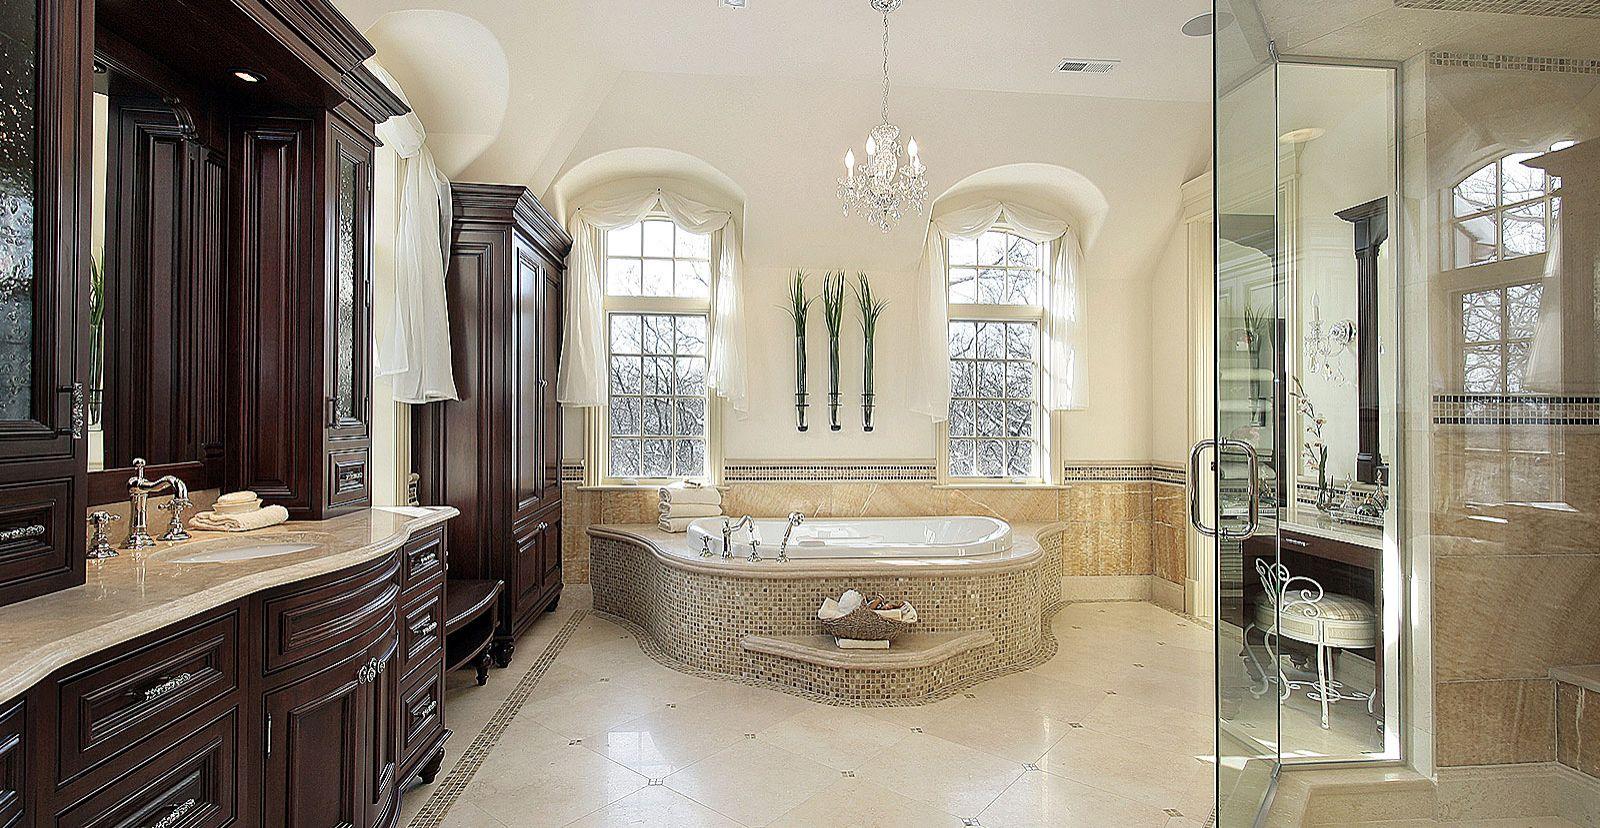 Bath - Jenna D'Amico